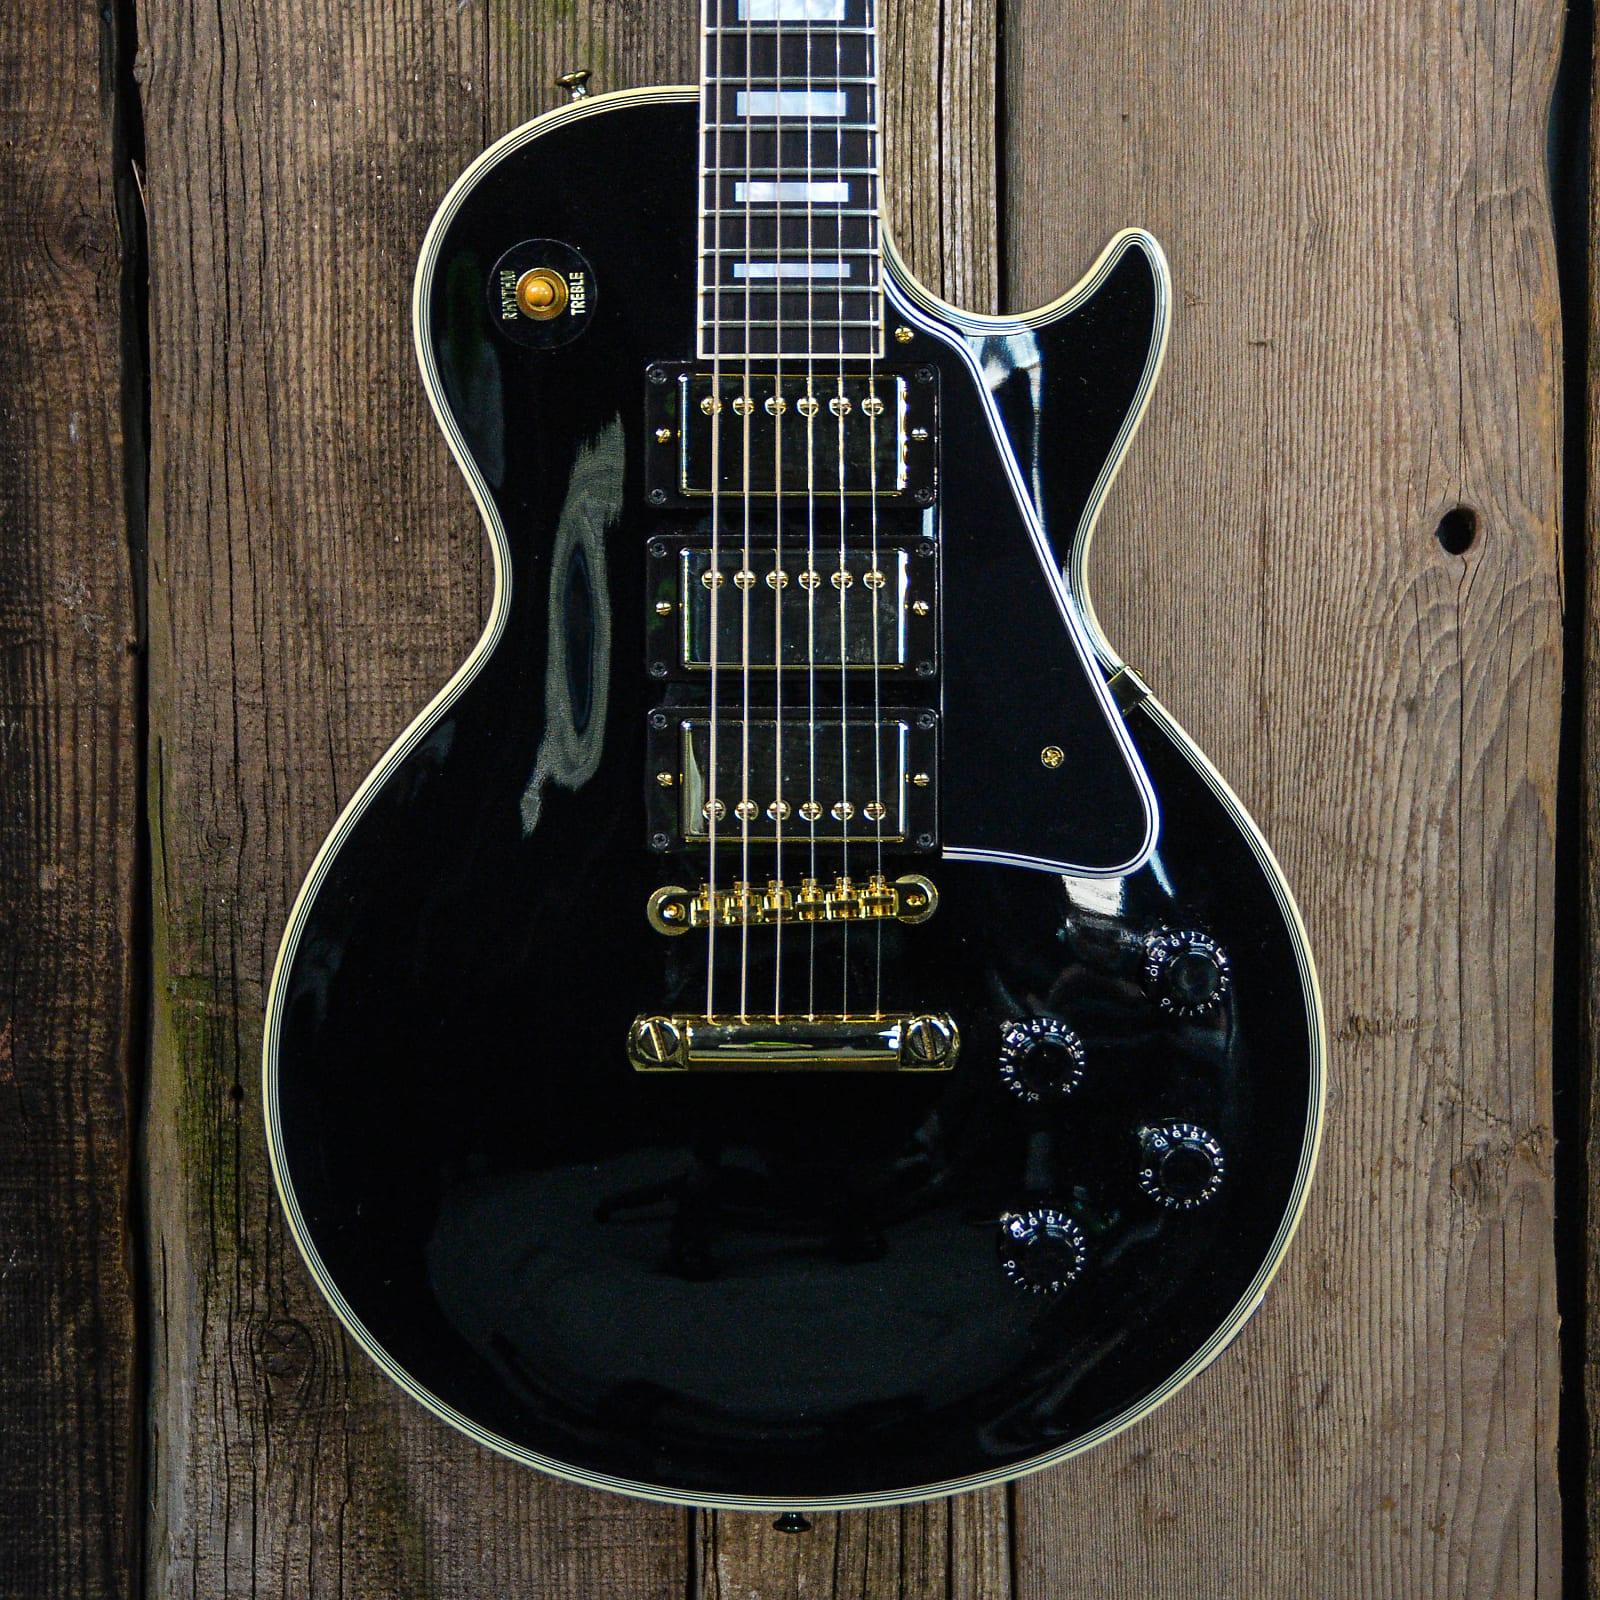 Gibson Custom Shop 20th Anniversary 1957 Les Paul Custom Reissue 2013 Ebony Gloss